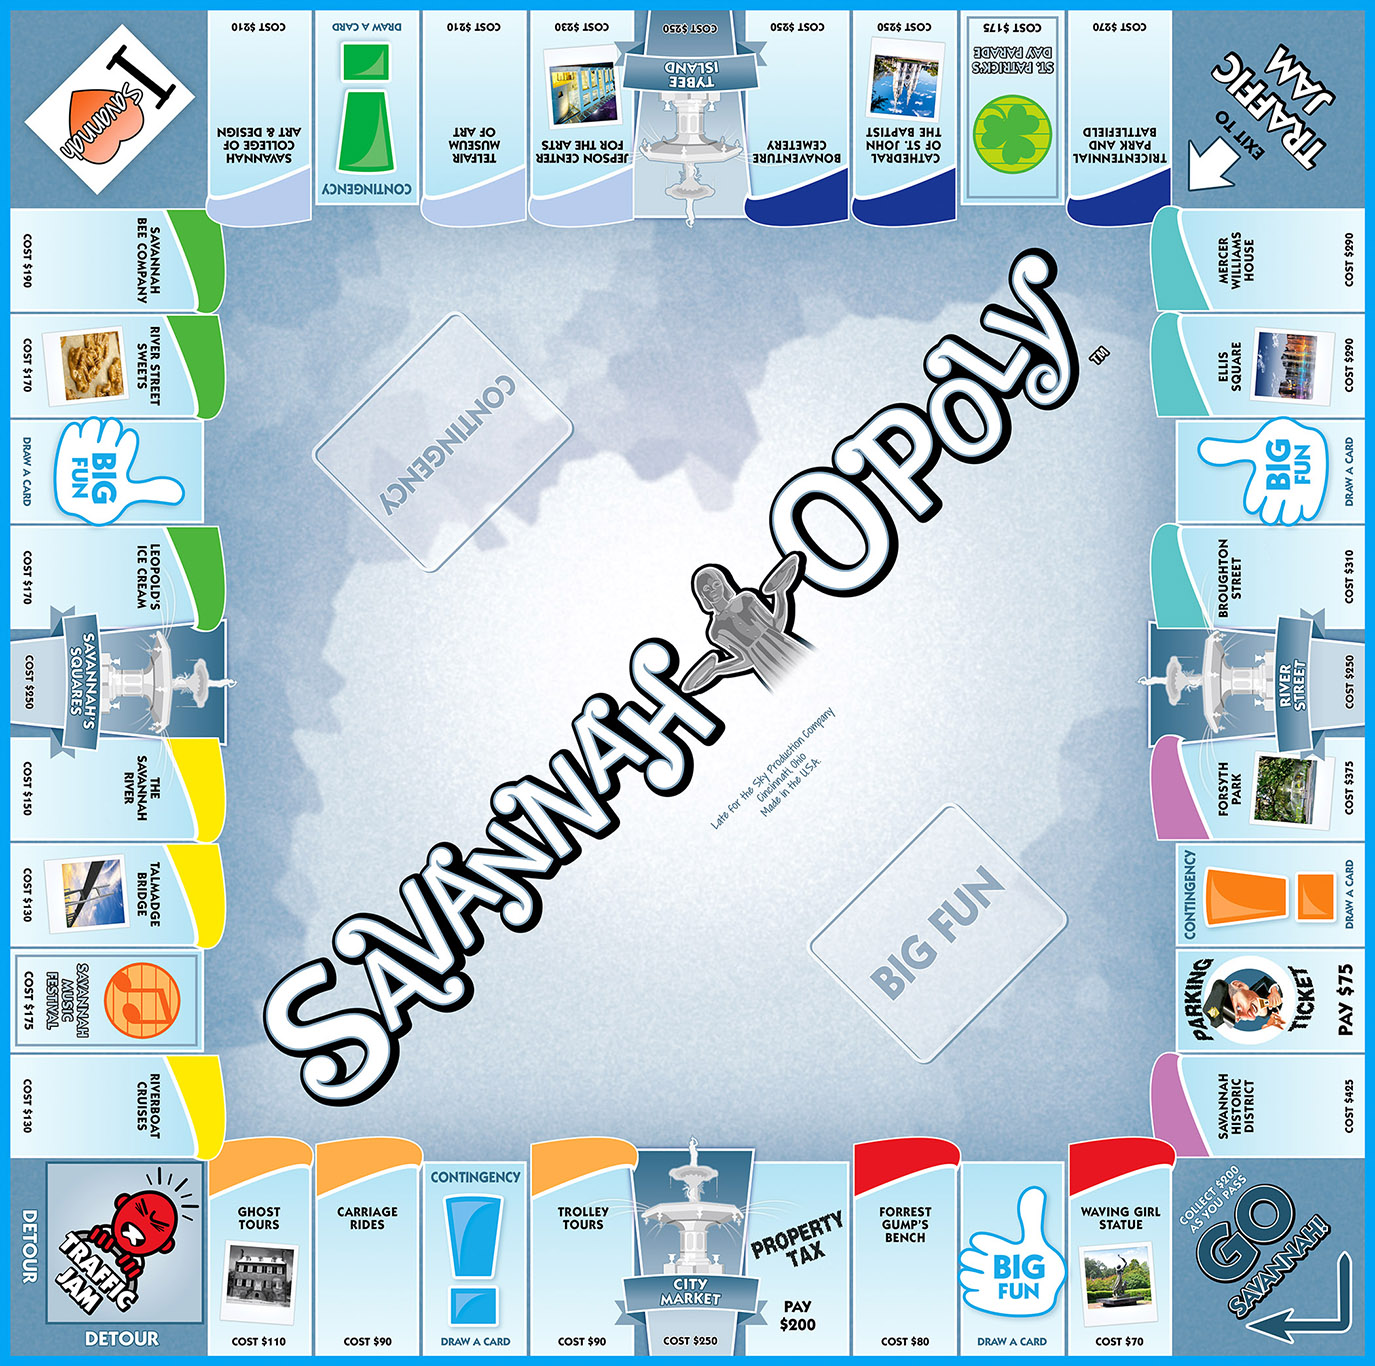 SAVANNAH-OPOLY Board Game